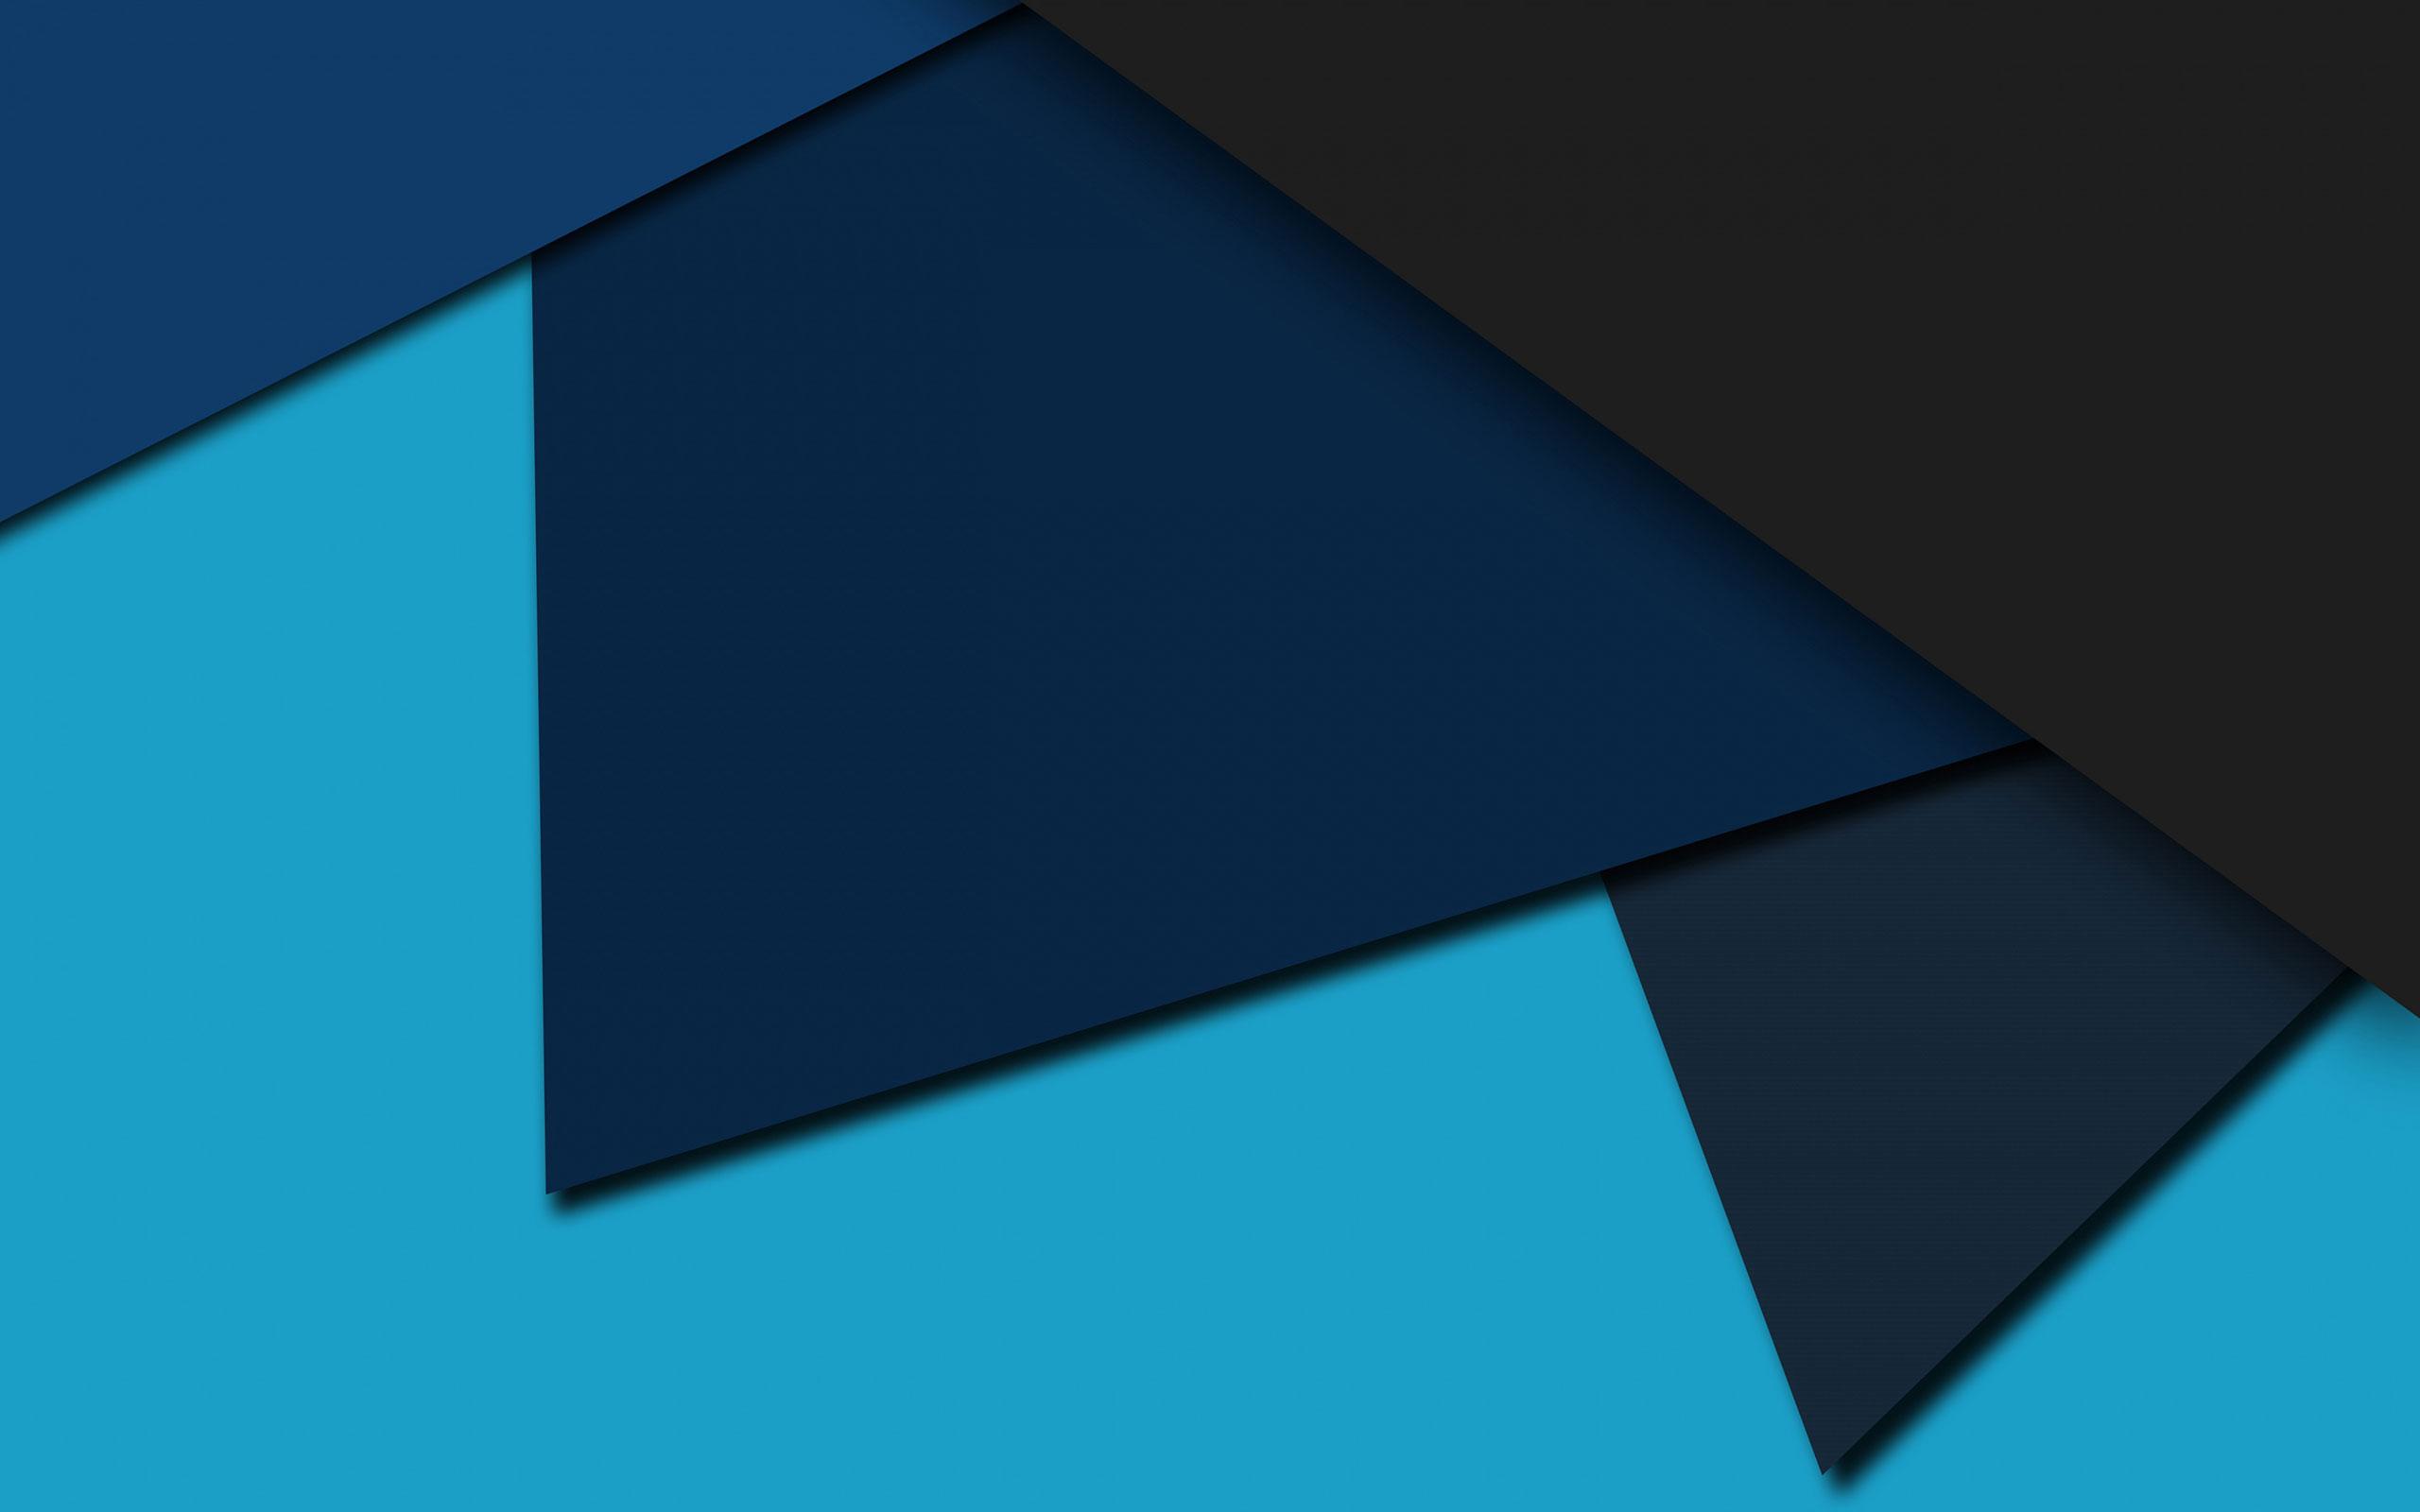 Google Material Design Wallpapers 2560x1600